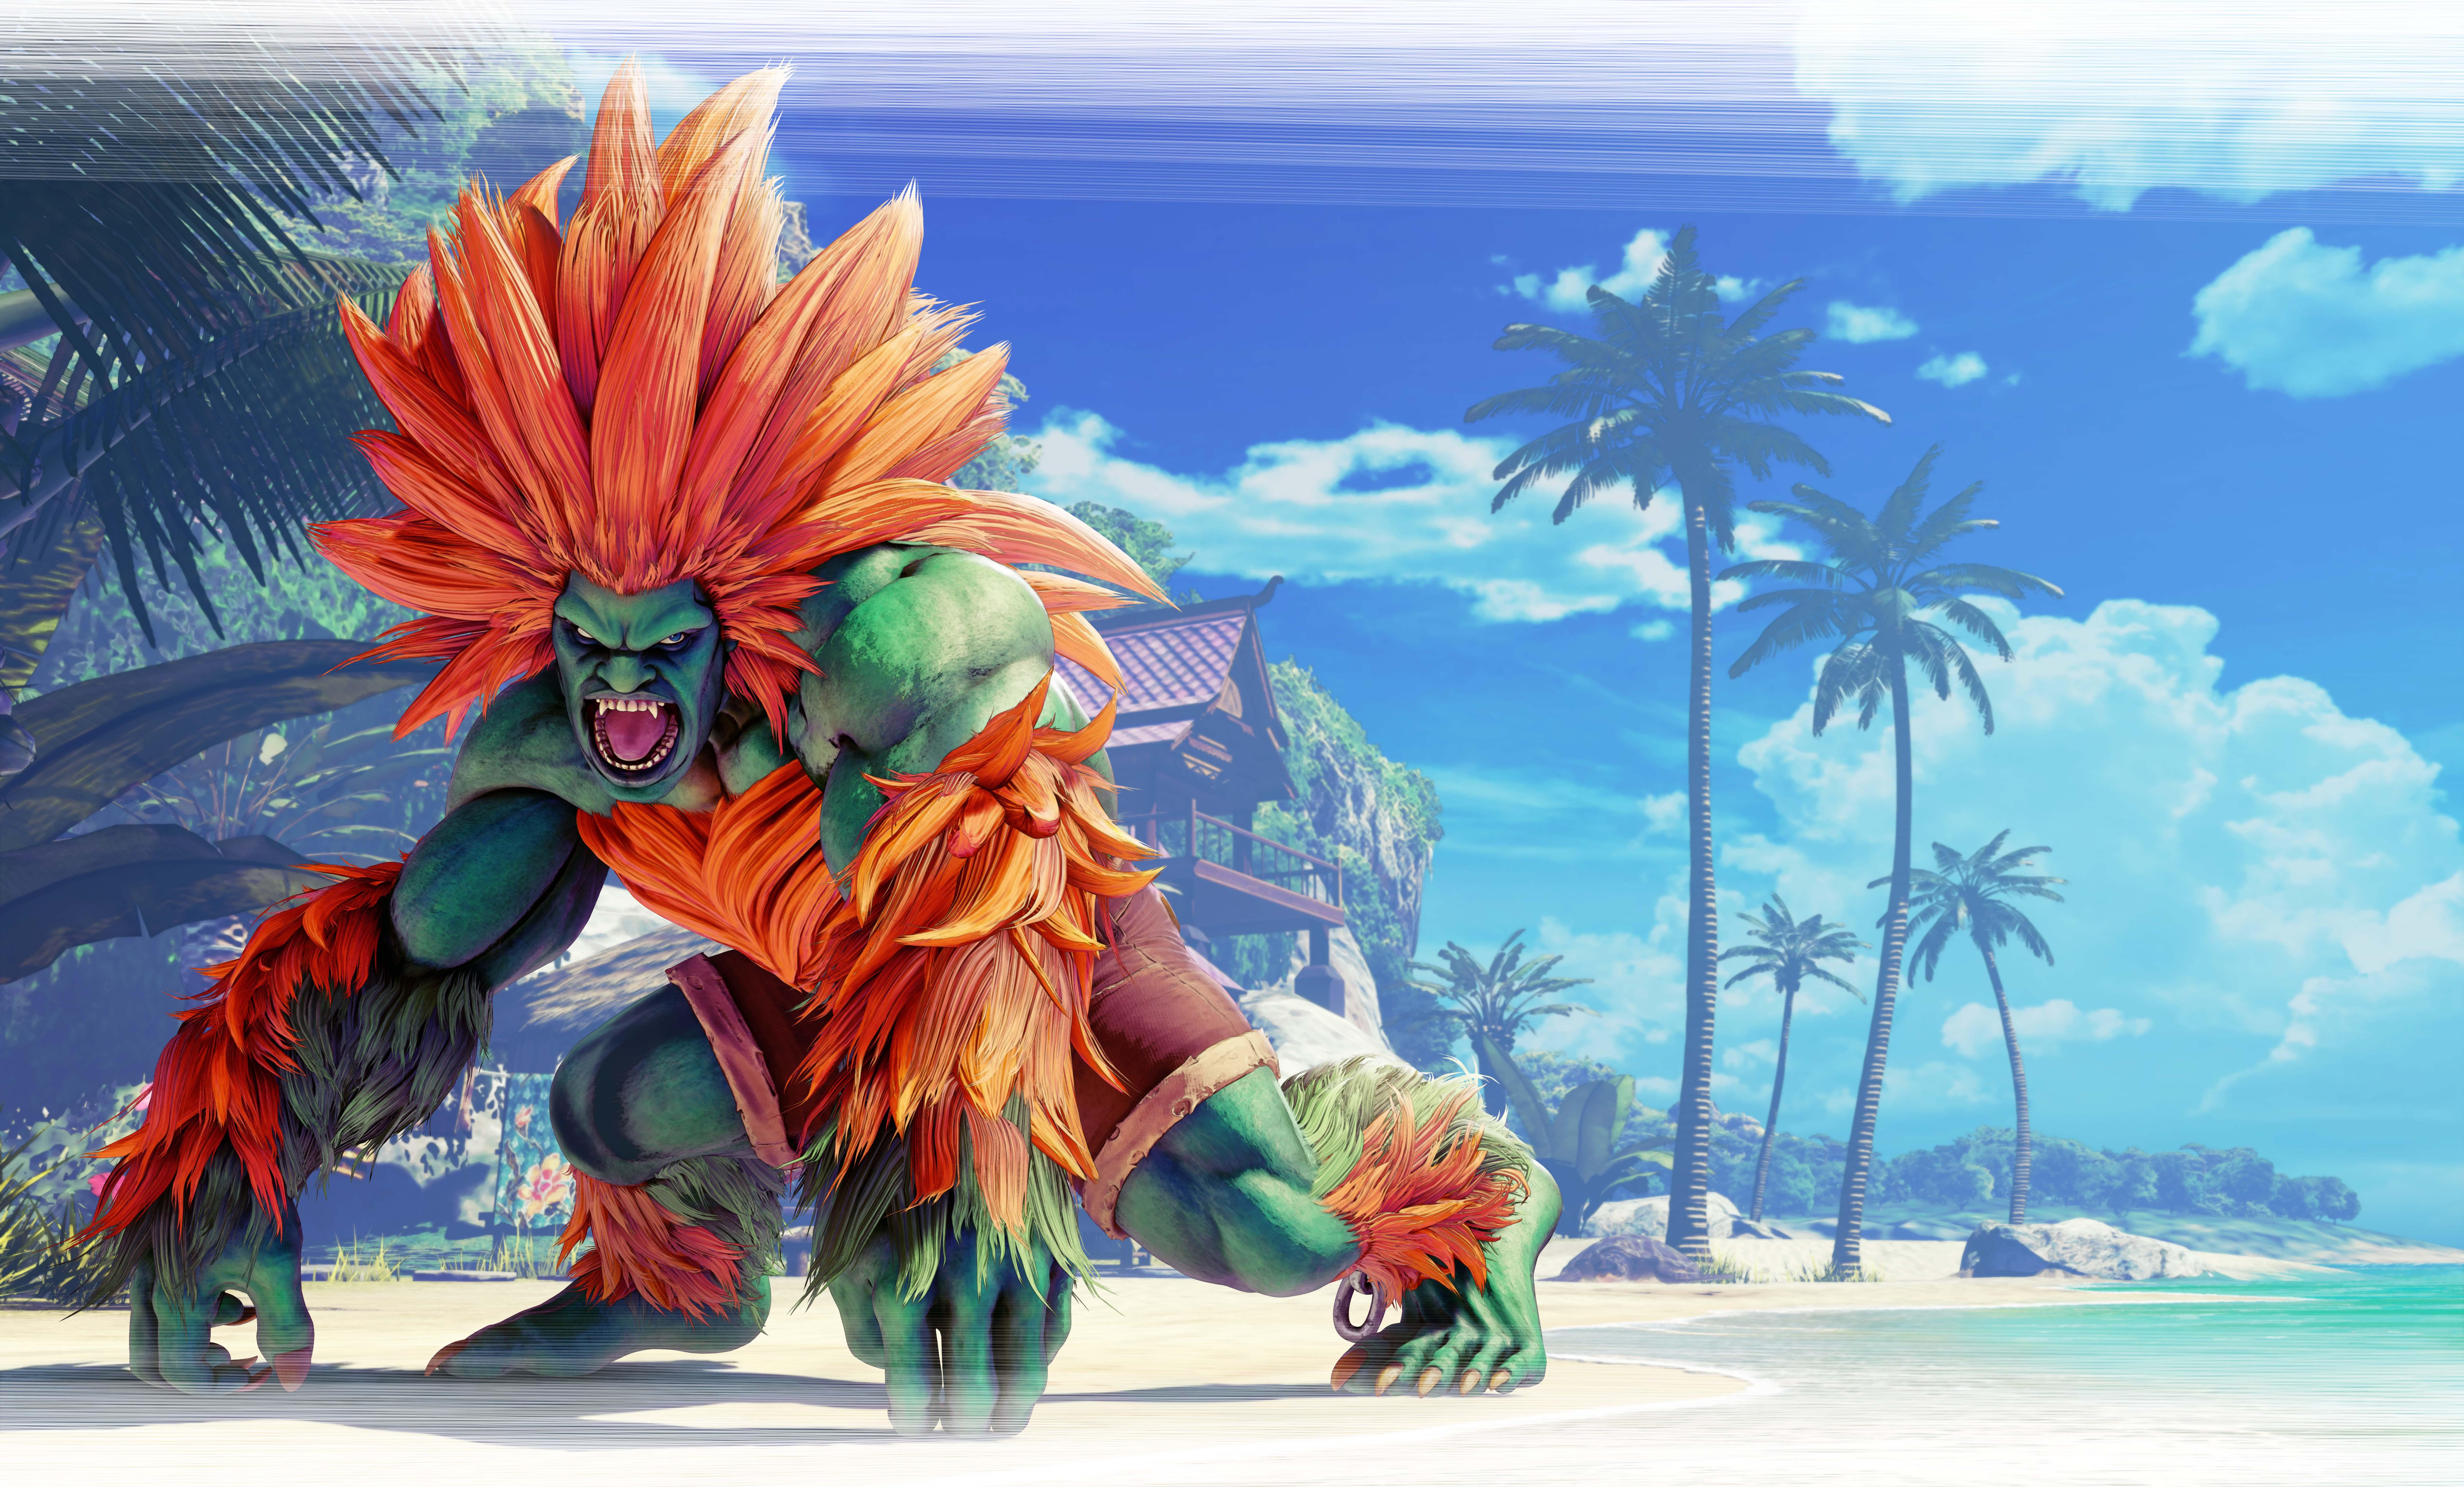 Blanka Street Fighter V 8k Hd Games 4k Wallpapers Images